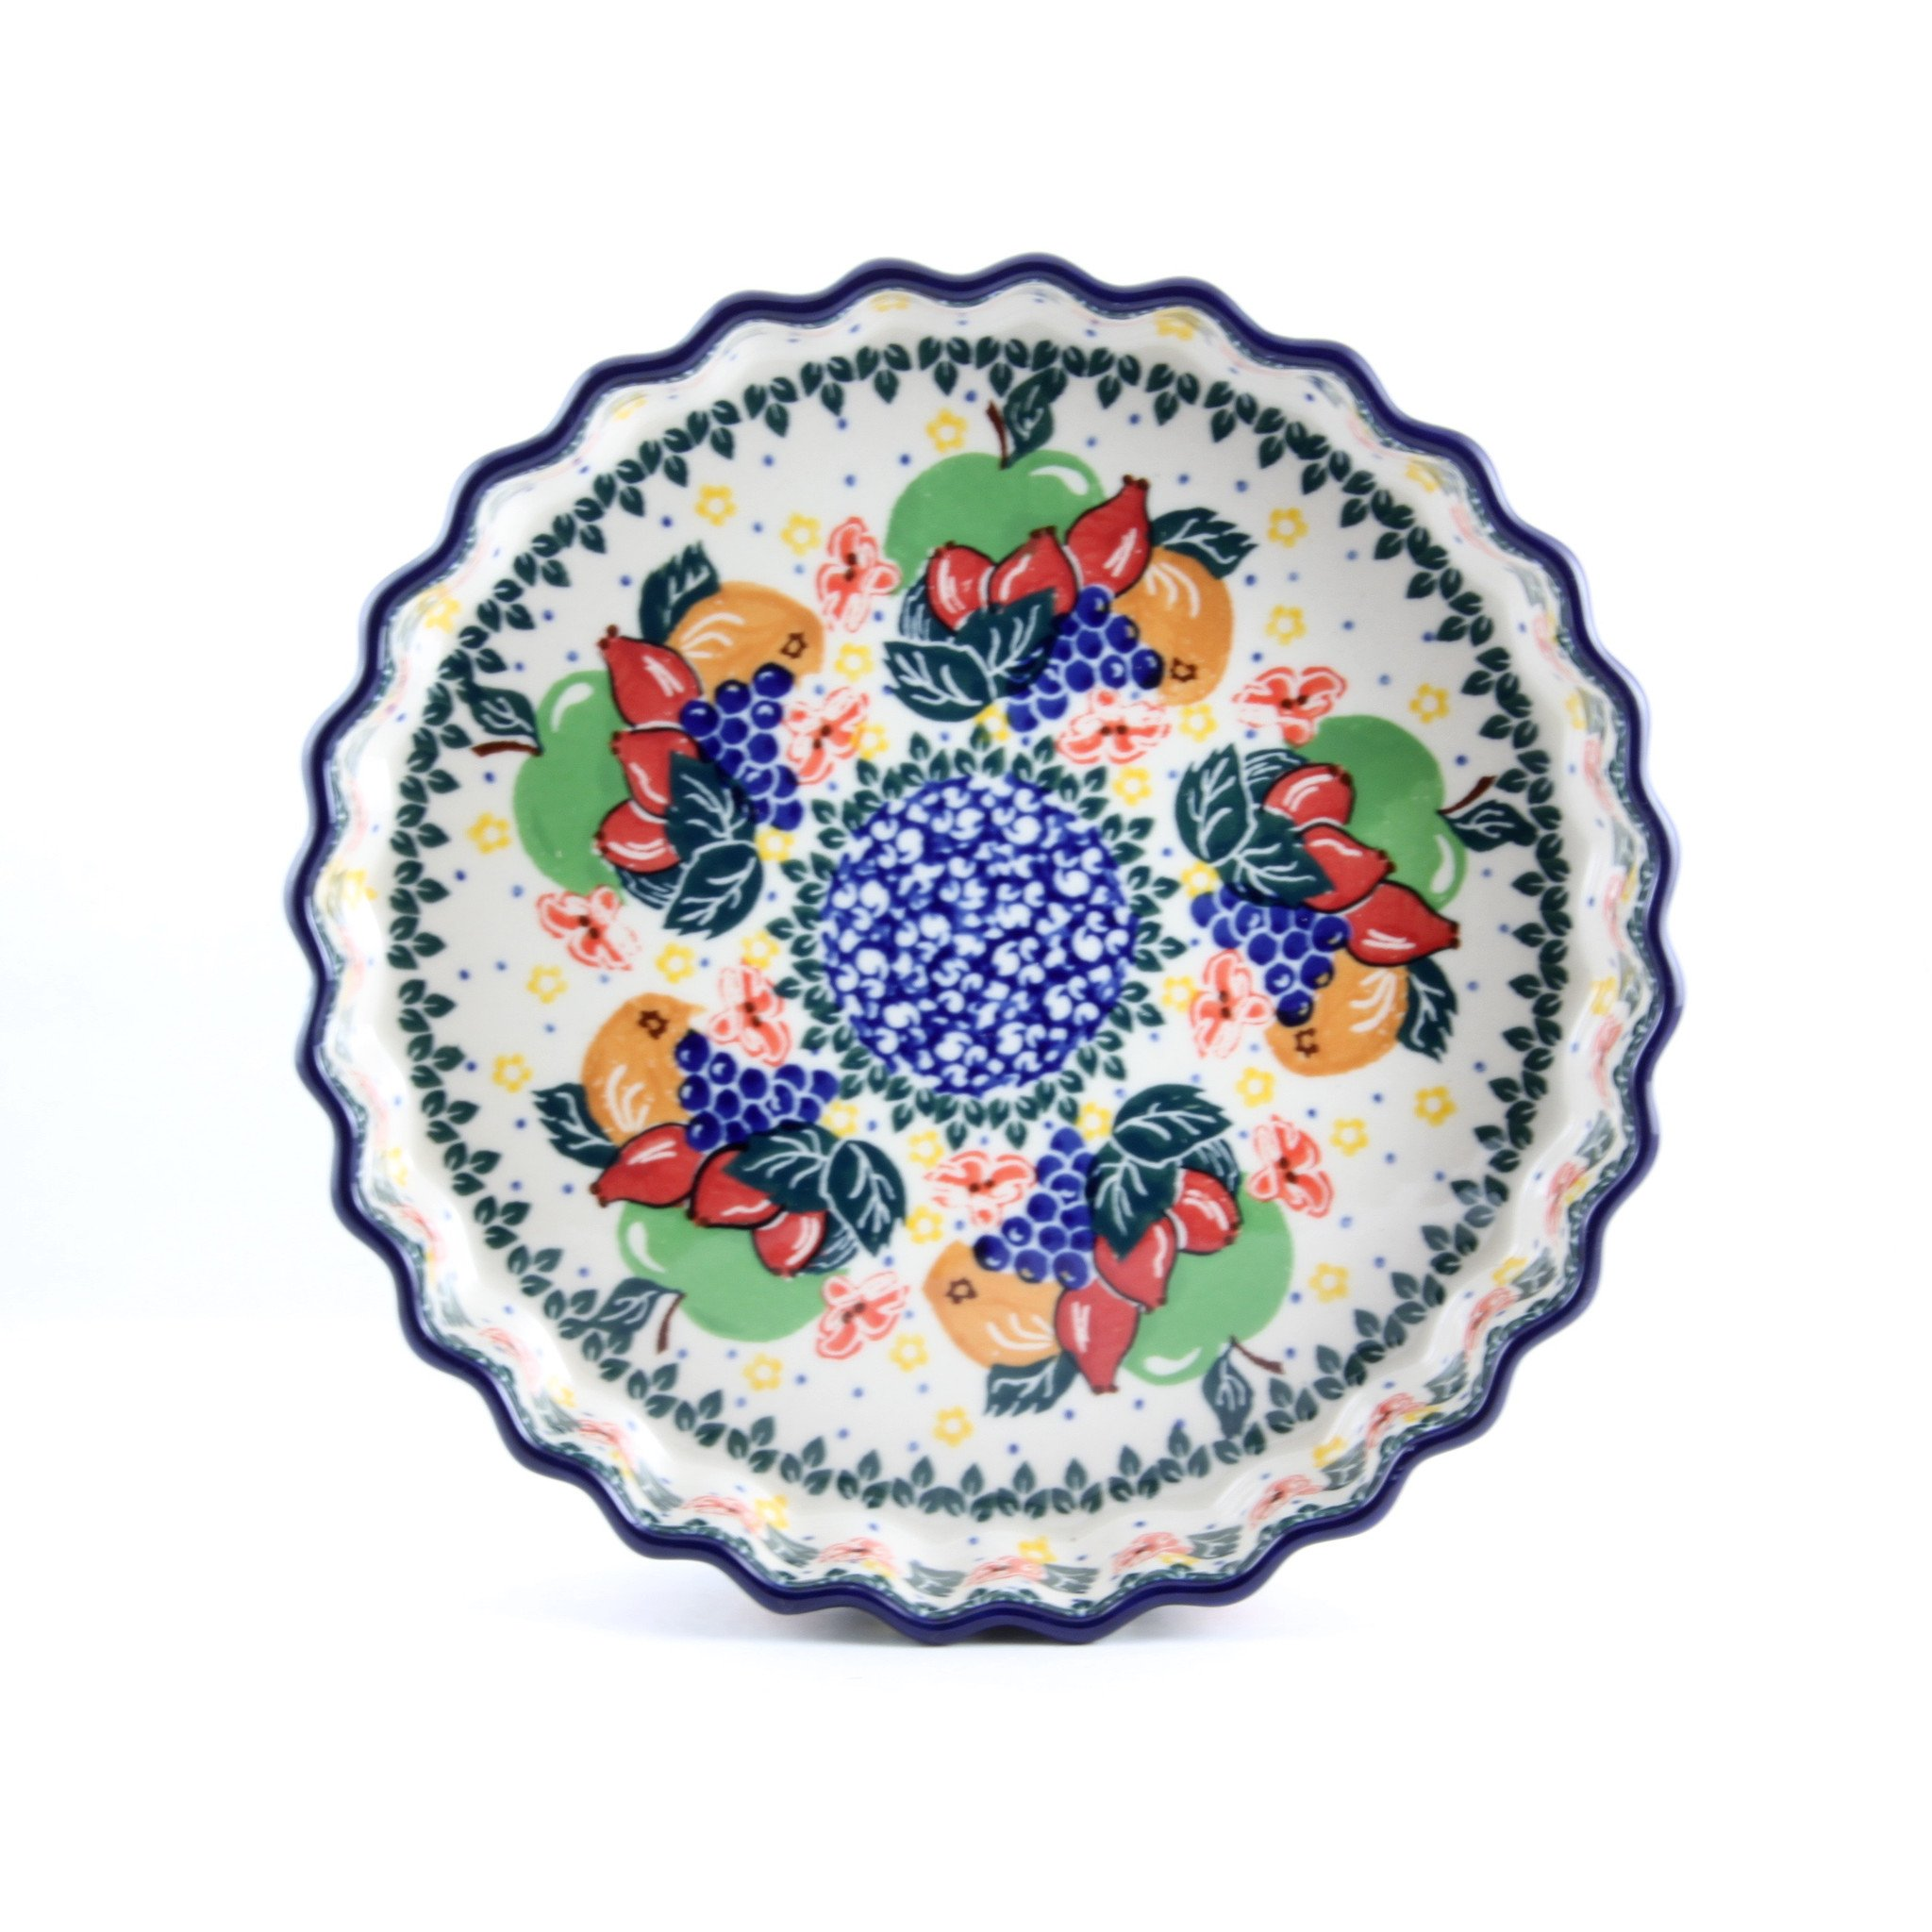 Ceramika Artystyczna Handmade Ceramic Fluted Quiche Dish Polish Pottery Hand Painted Unikat Design